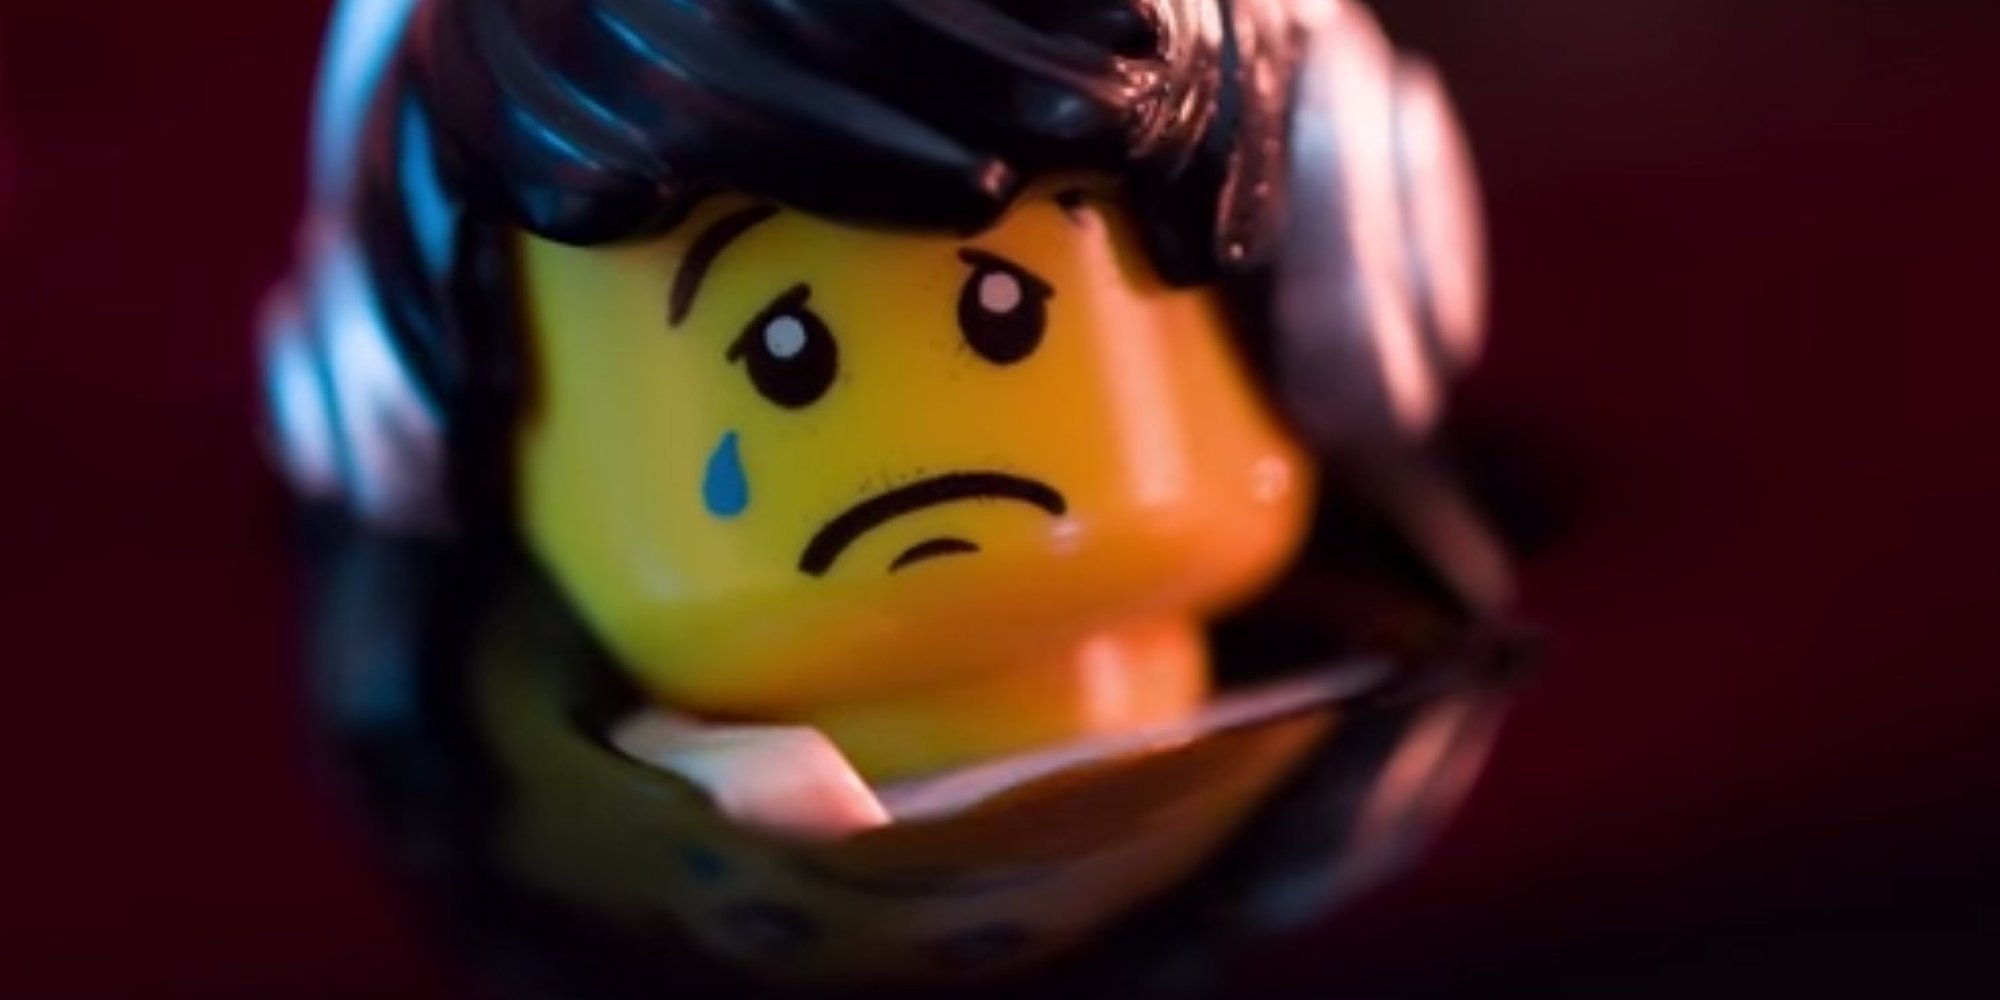 Image Gallery Sad Lego